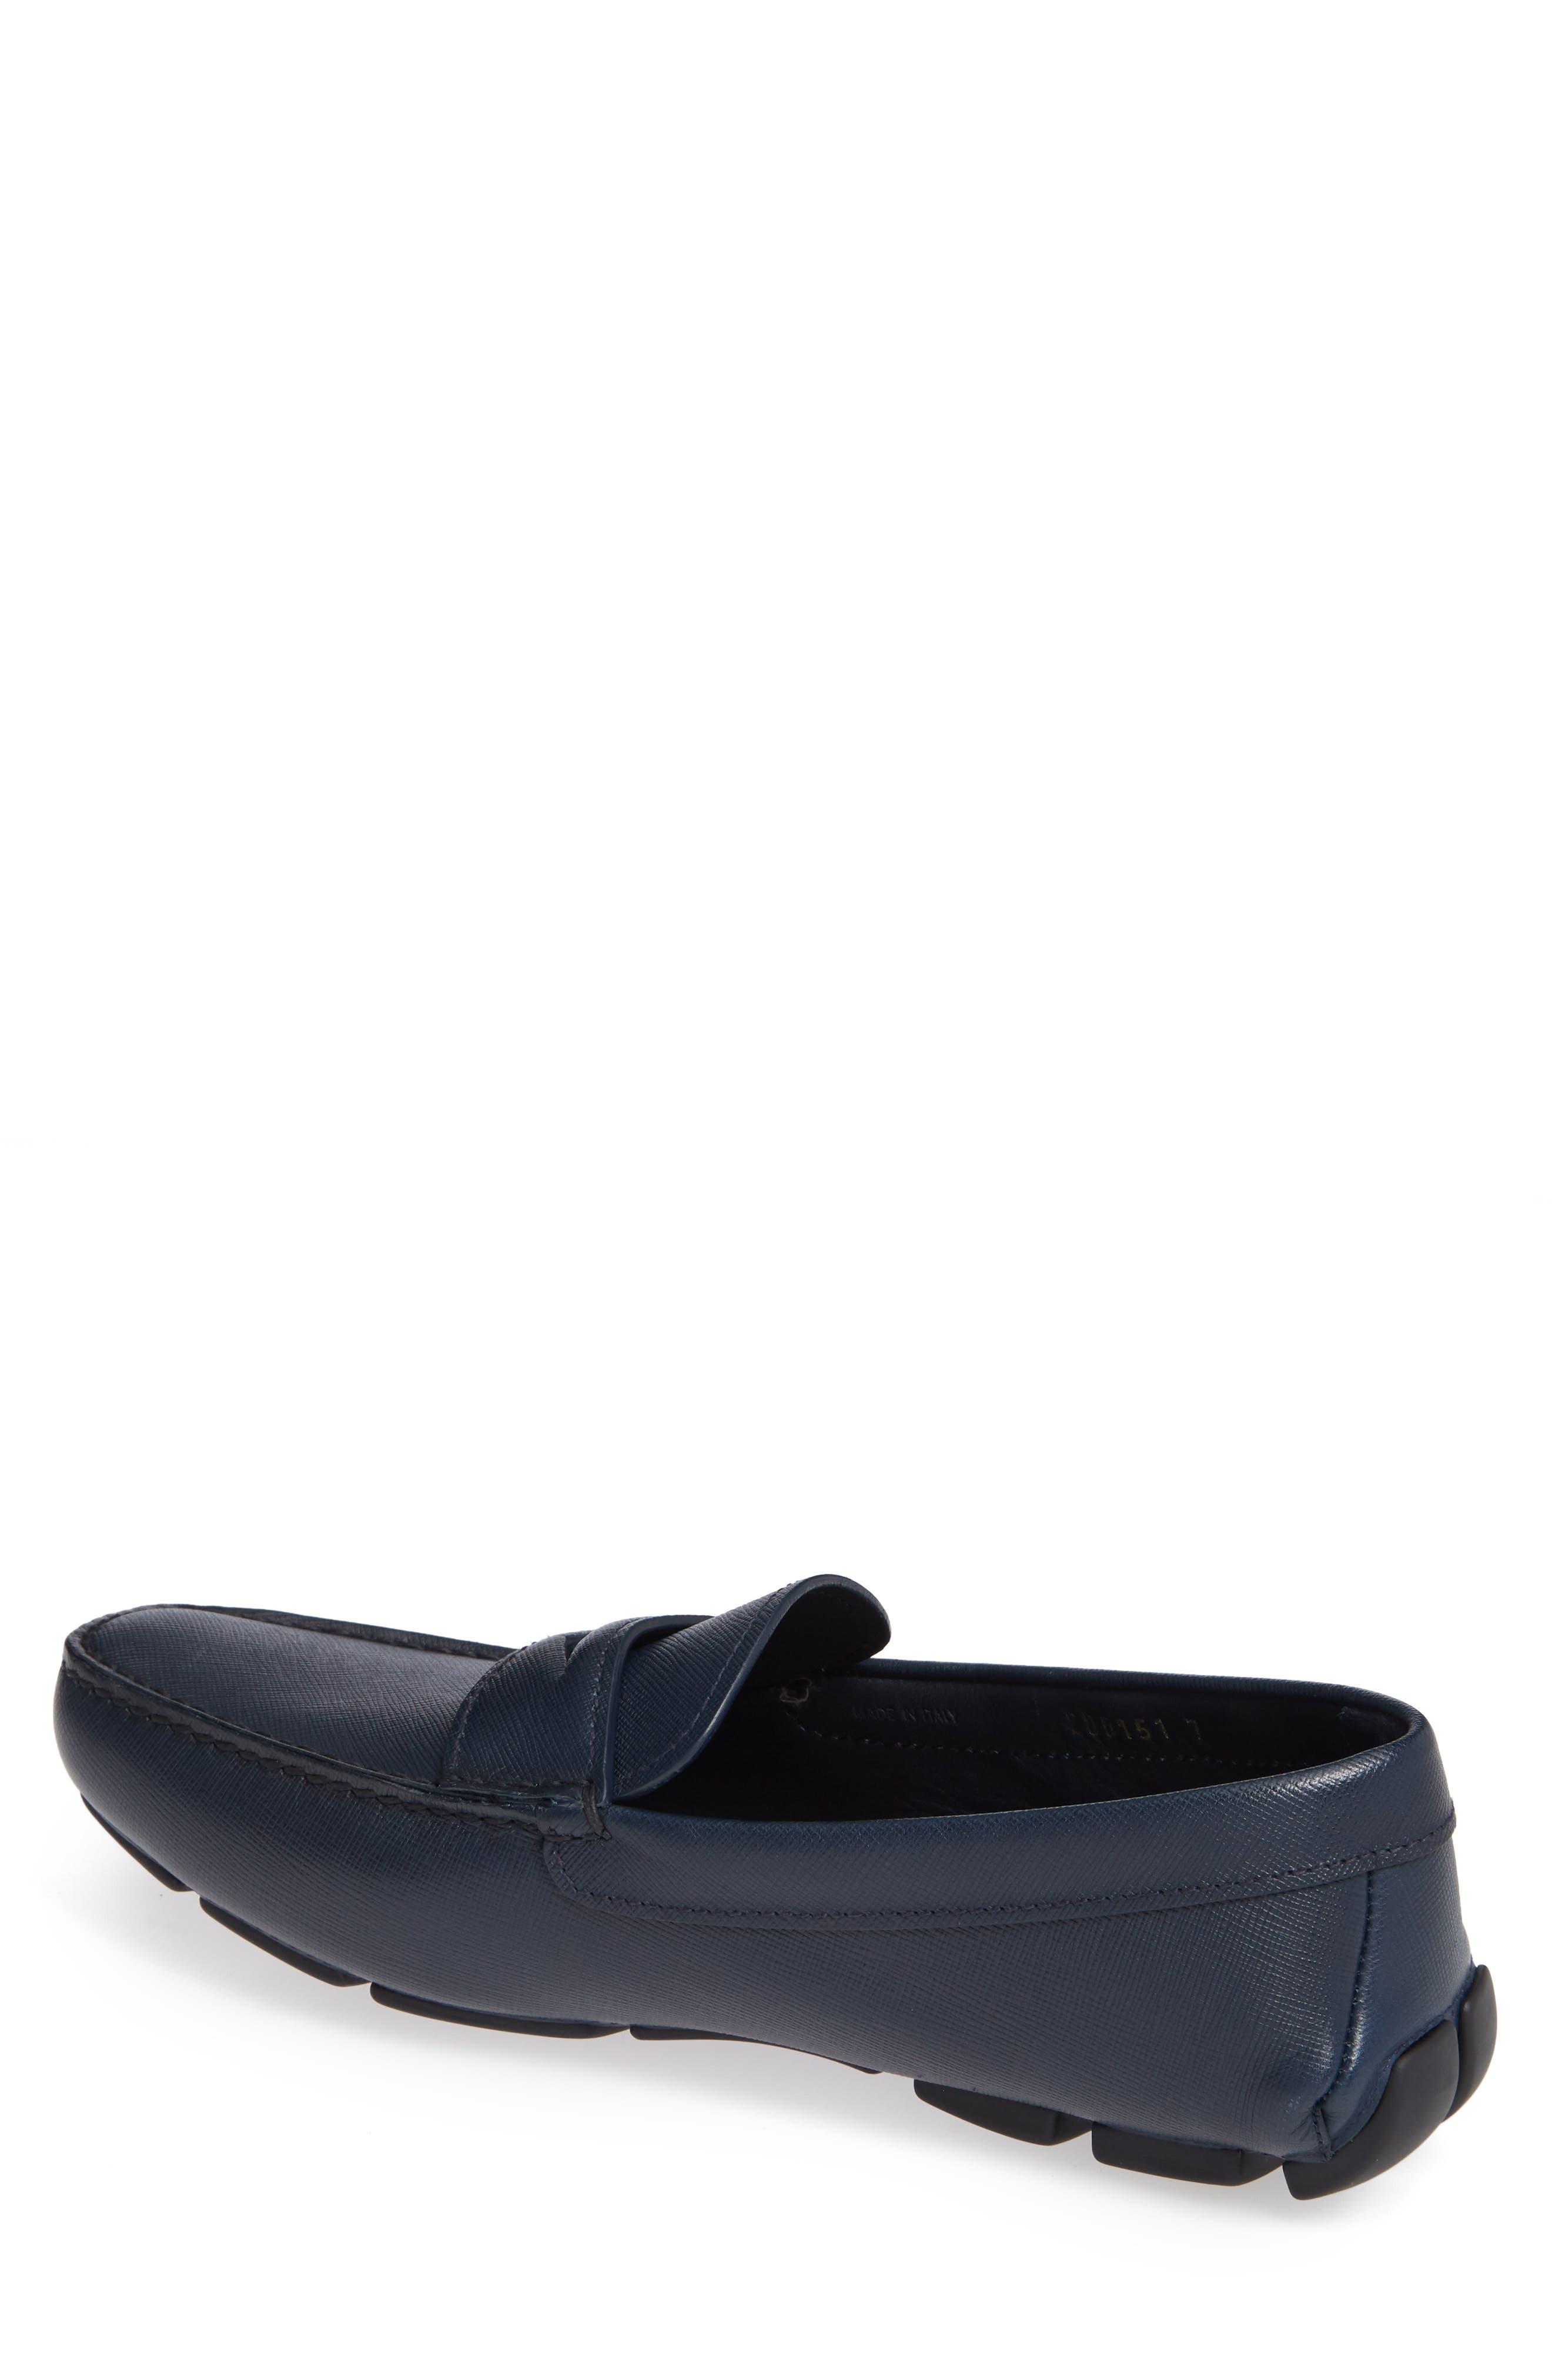 Driving Shoe,                             Alternate thumbnail 2, color,                             Baltico Blue